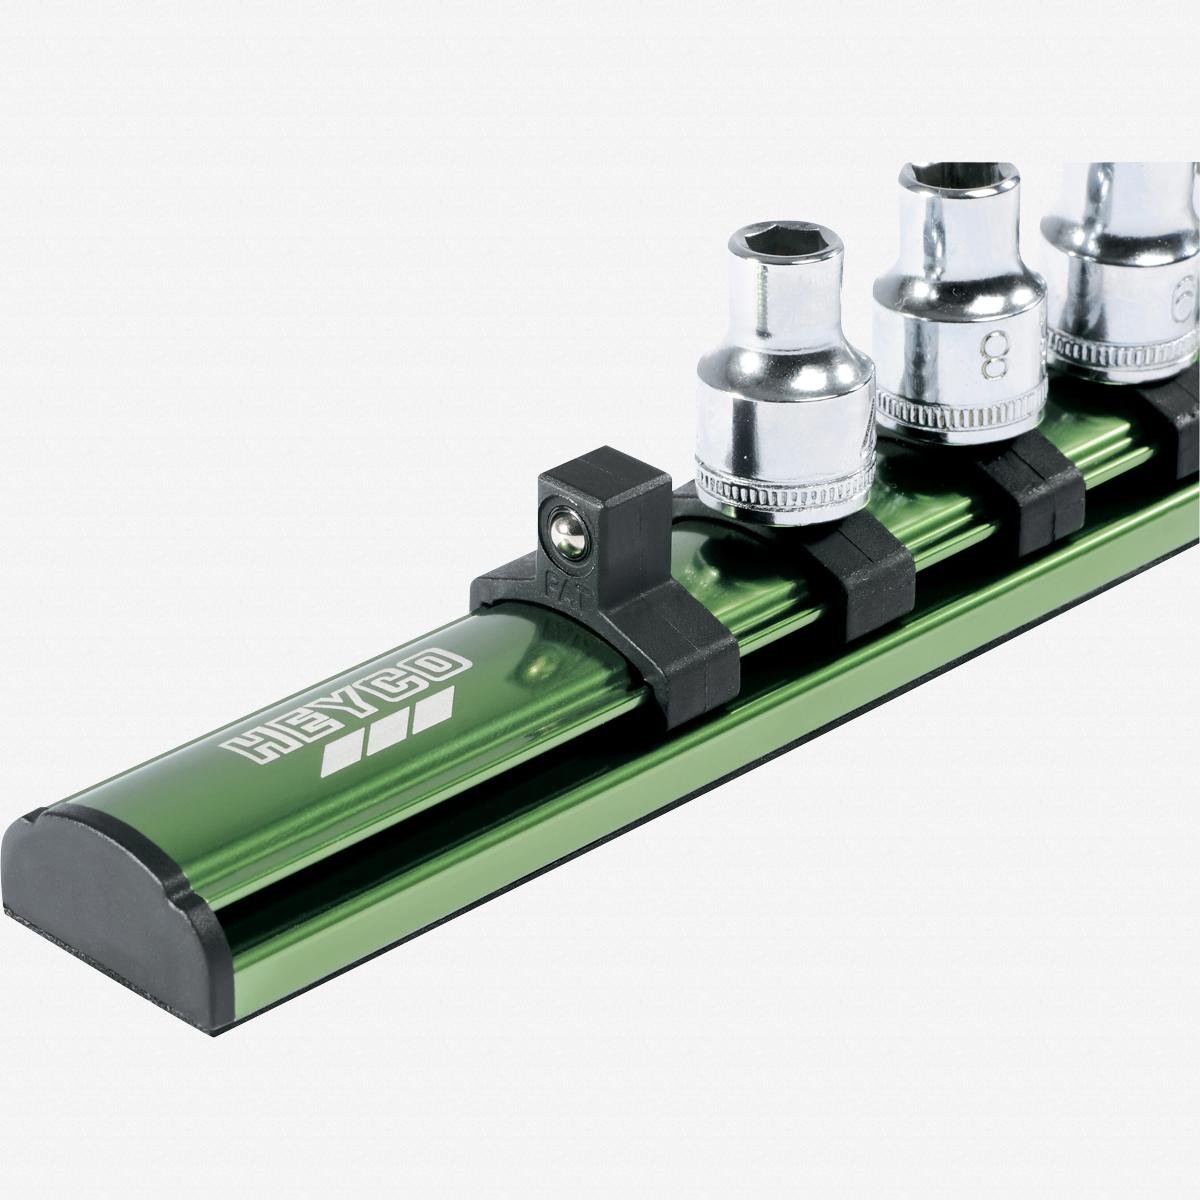 "Heyco 7105016 Magnetic Aluminum Socket Rail - Empty, 1/2"" Drive - KC Tool"